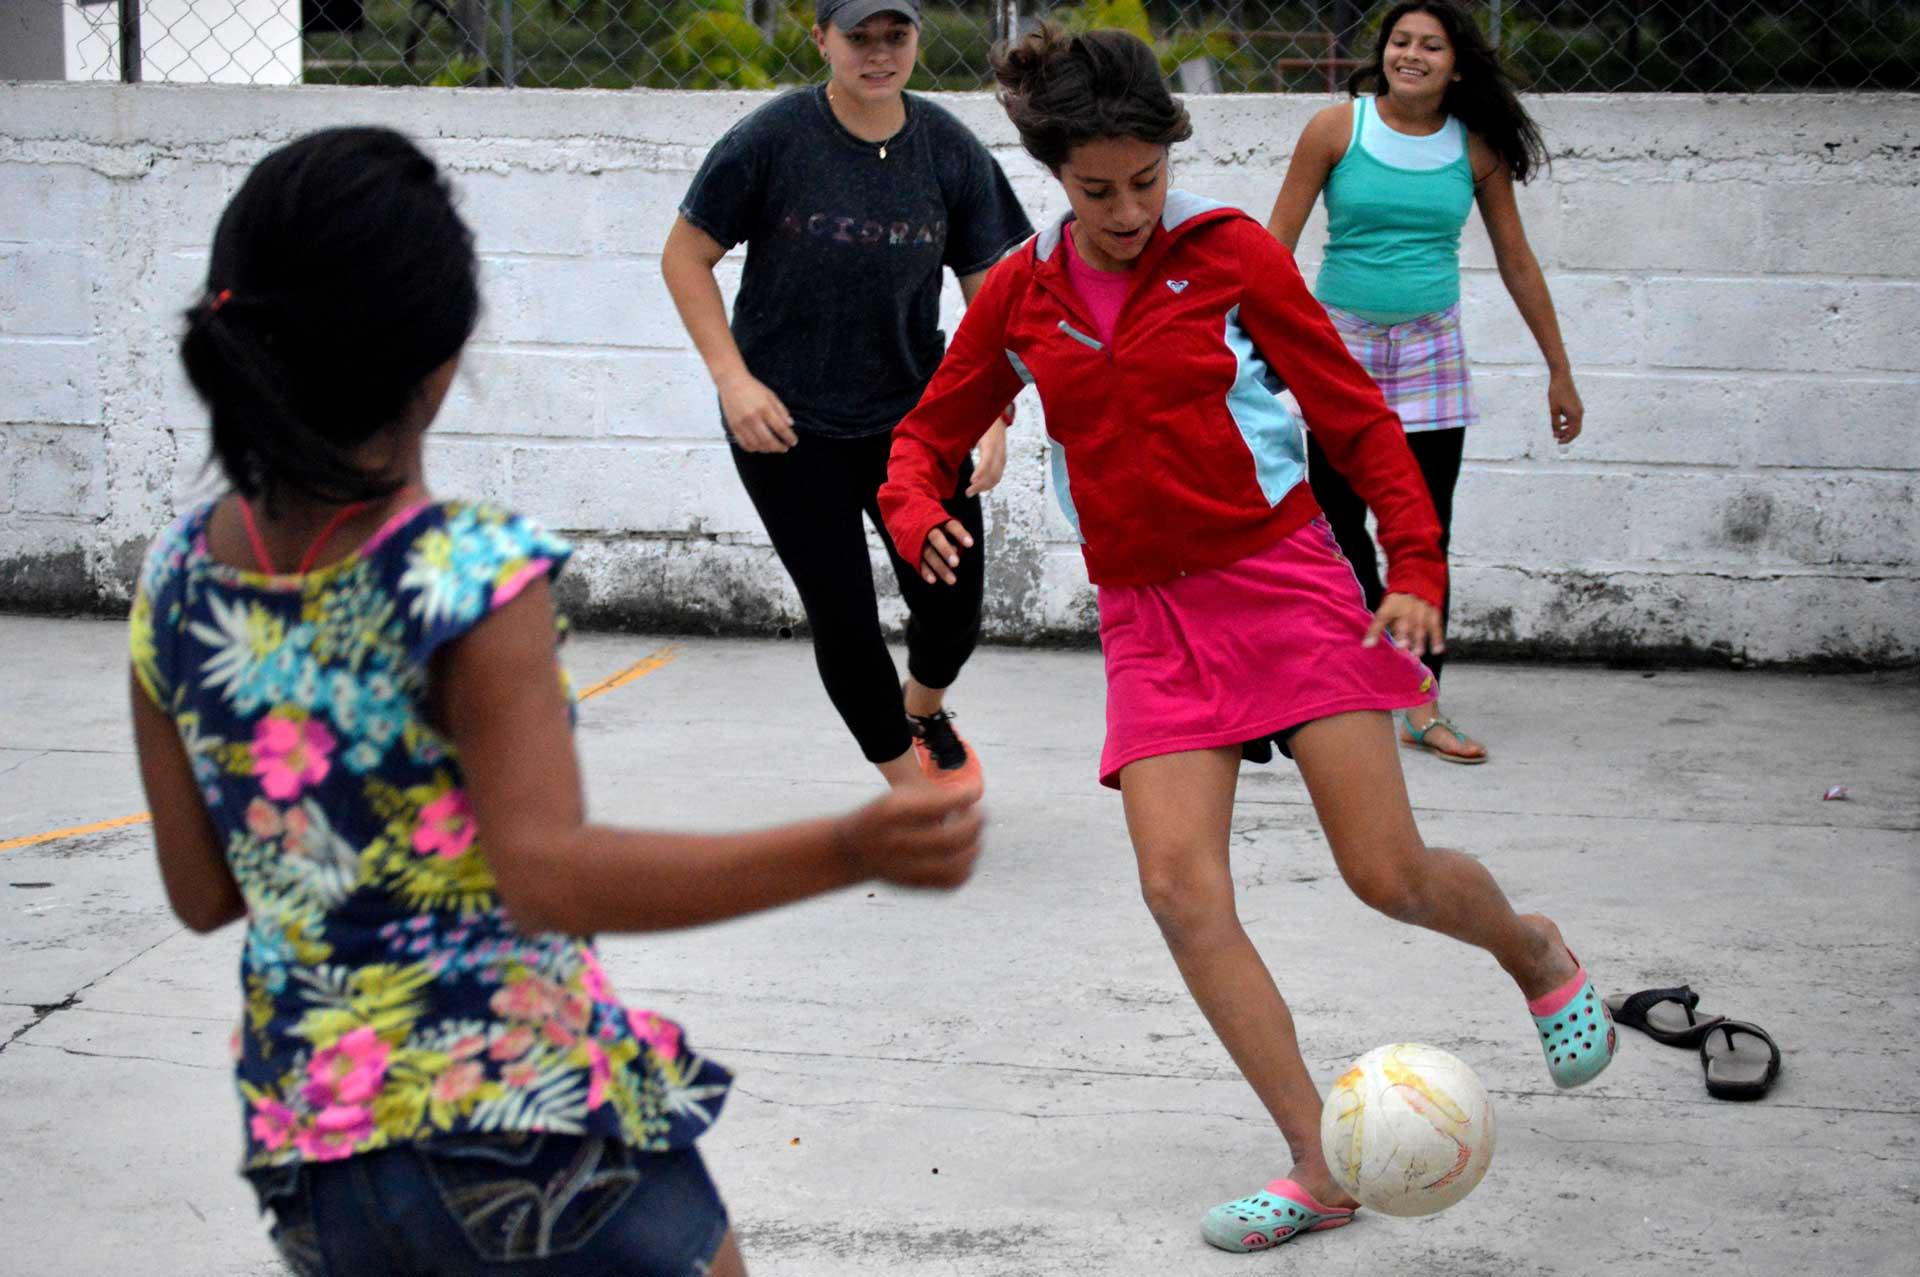 Niños jugando fútbol / fútbol